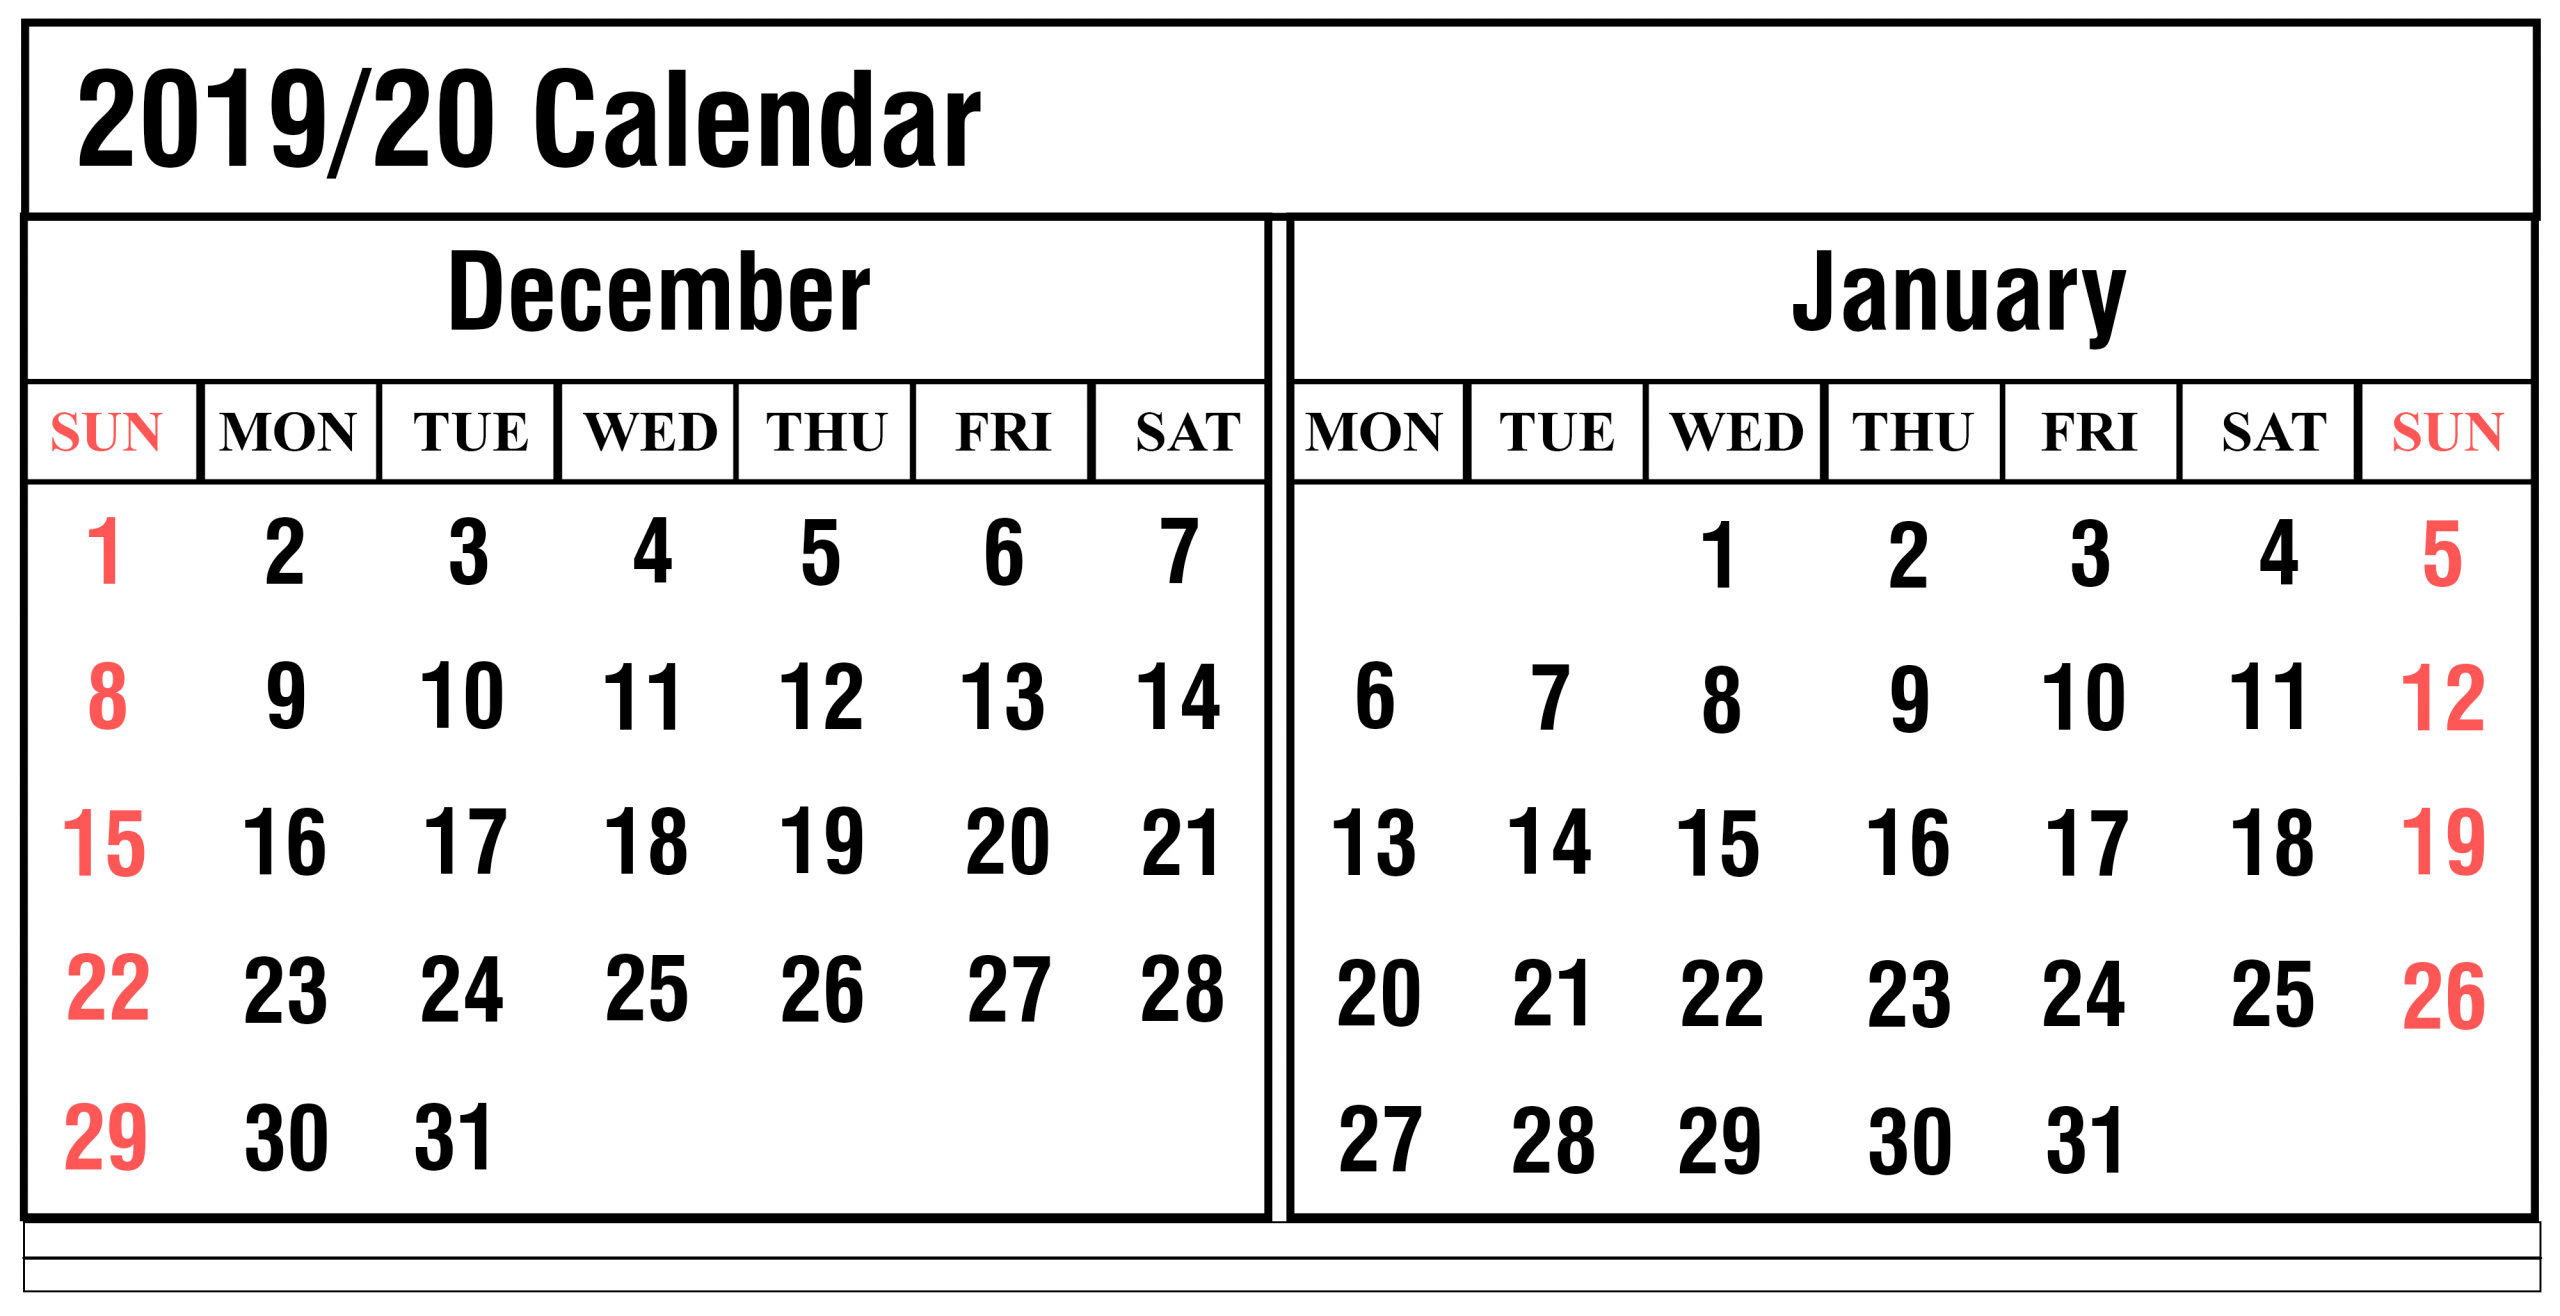 December 2019 Printable Calendar: Weekly Calendar For